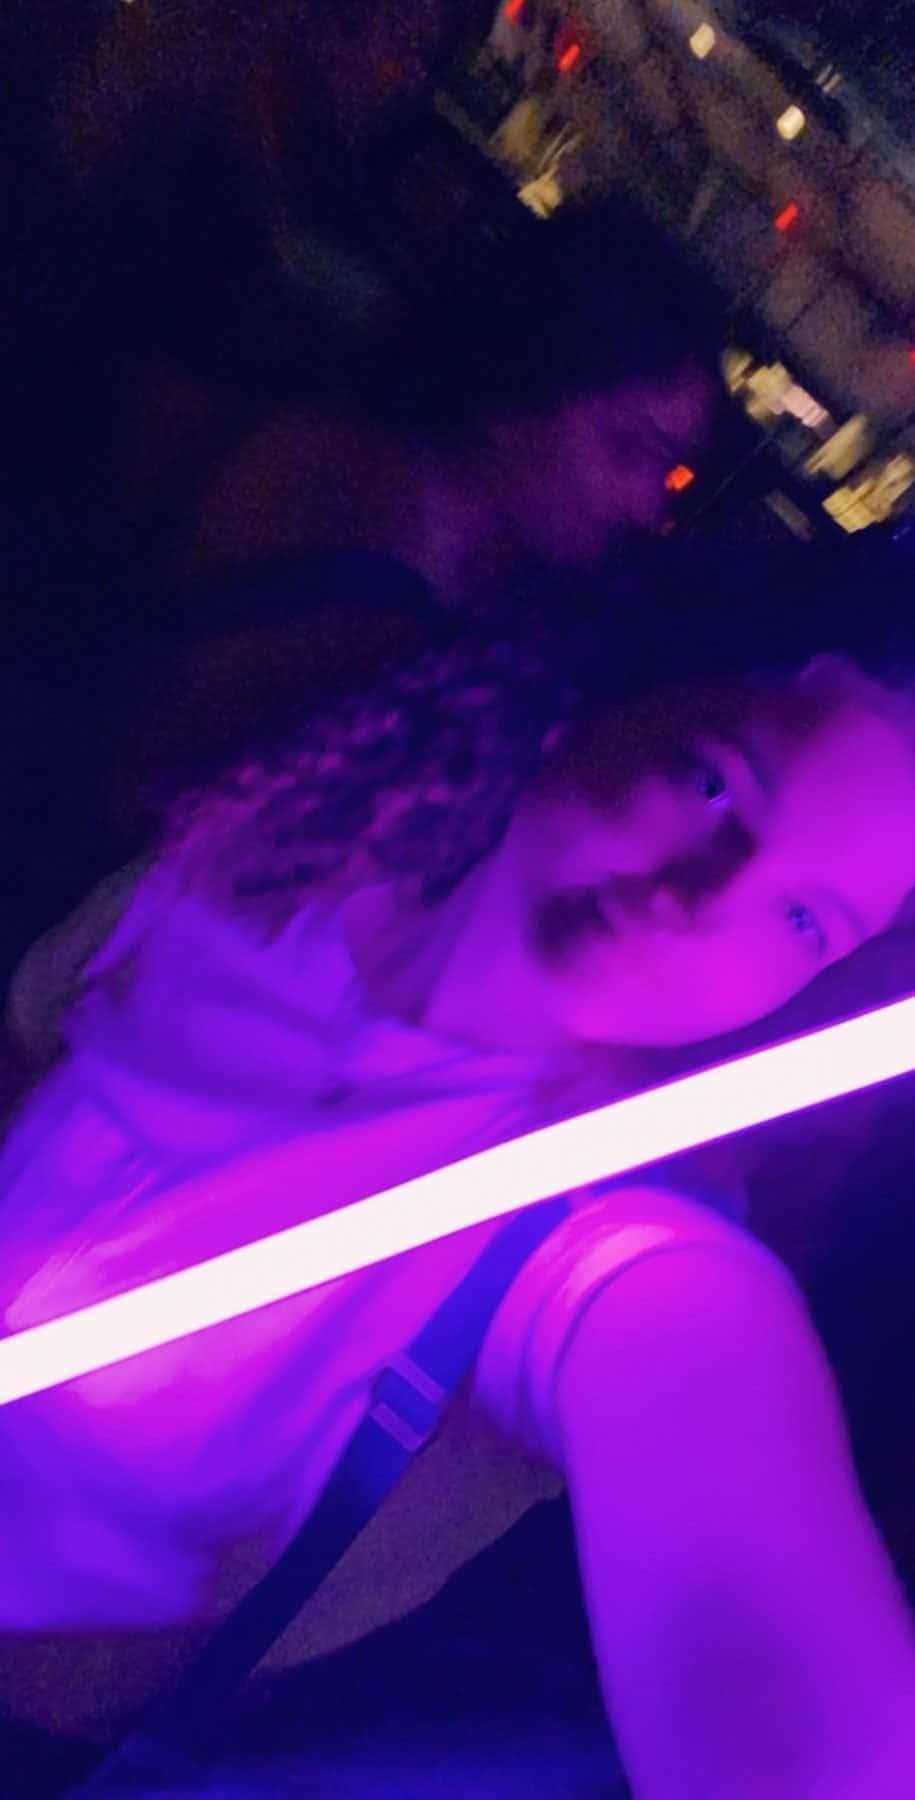 teenage girl holding a purple lightsaber